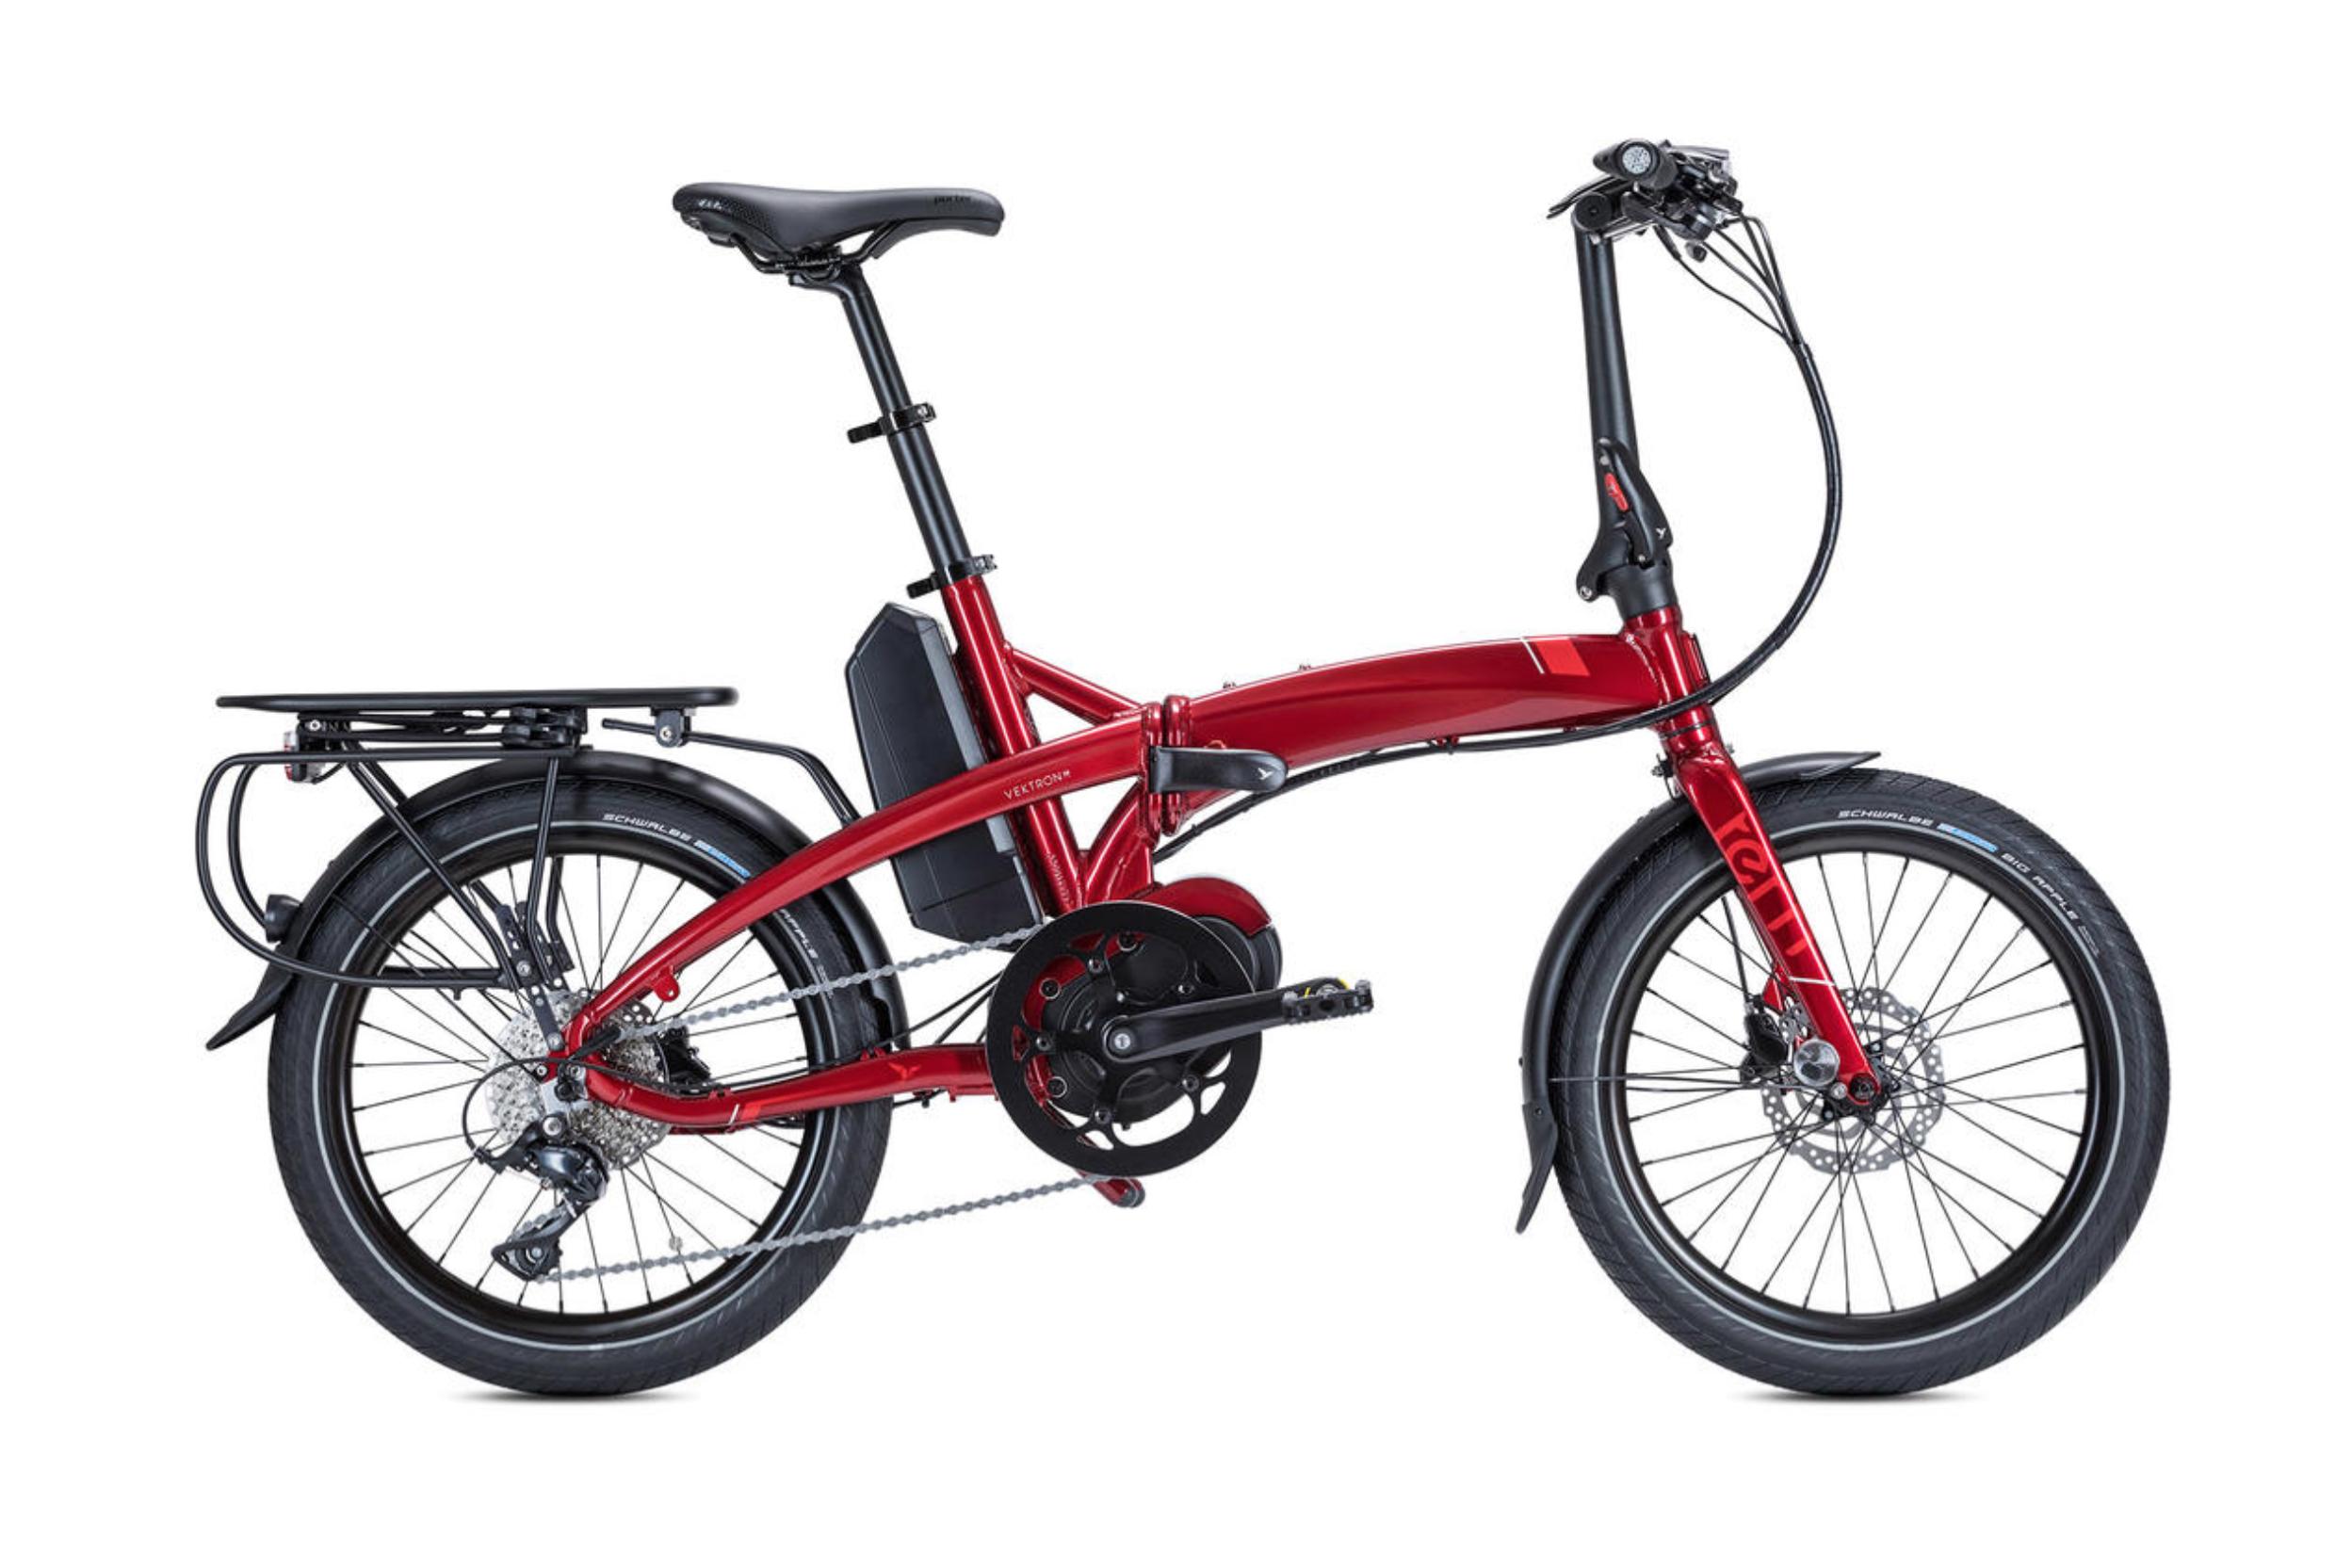 Tern Vektron P9 Electric Folding Bike